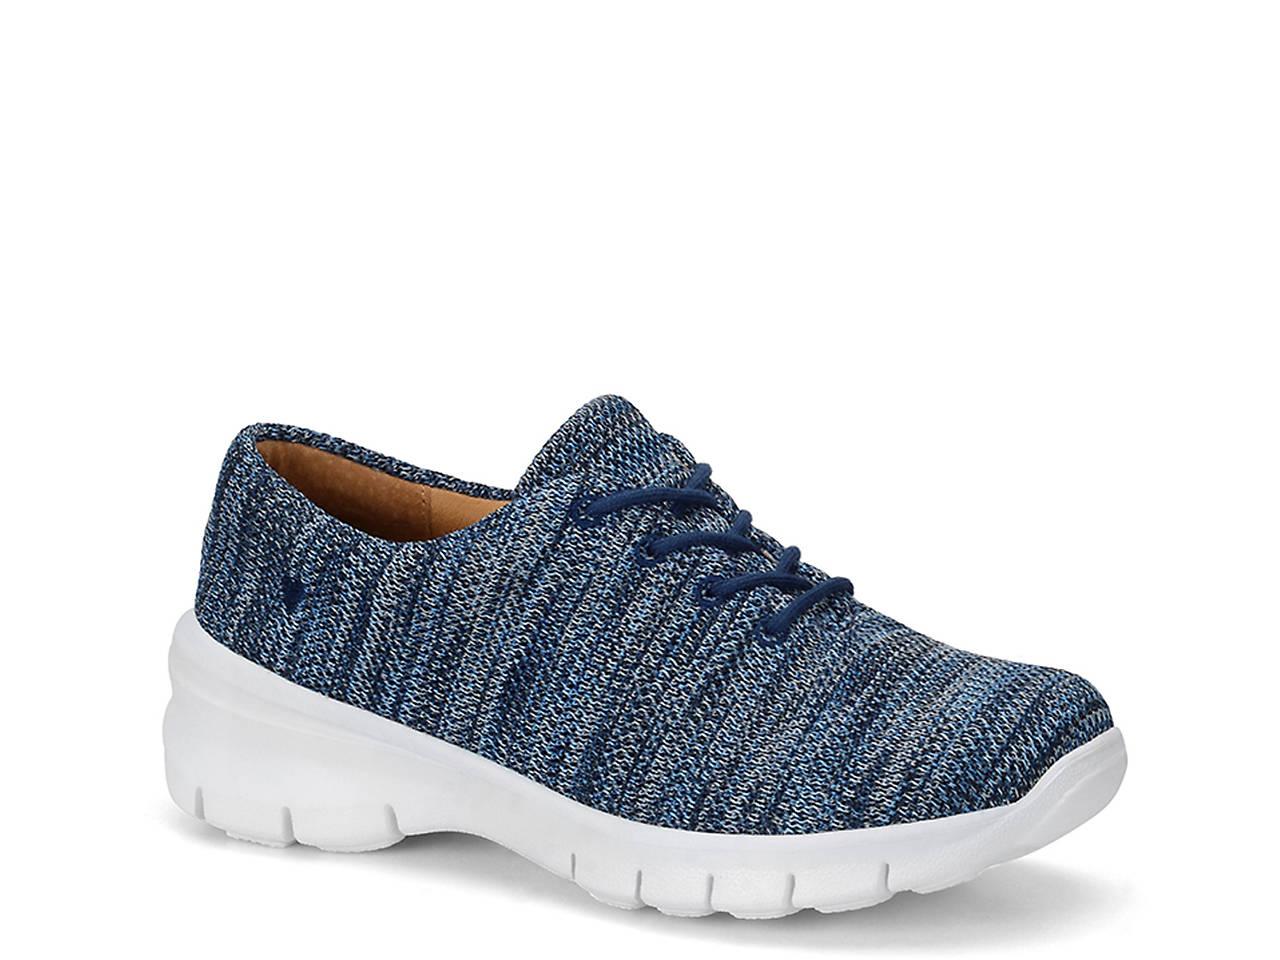 Nurse Mates Lacey Sneaker (Women's) YId556